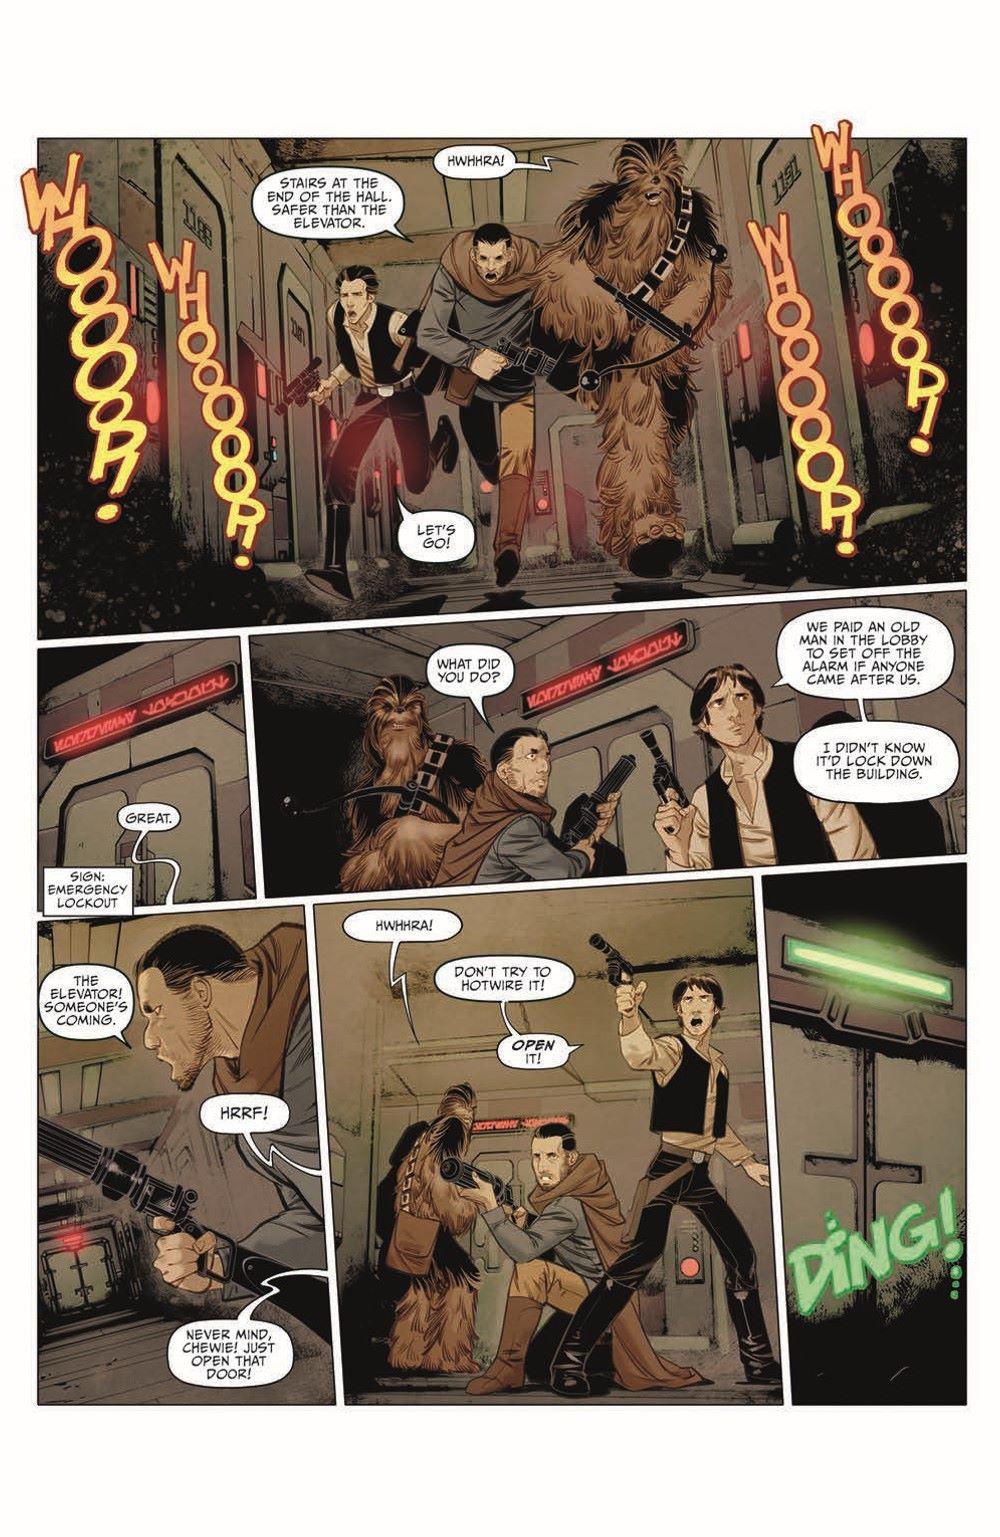 SWA_Smuggler02_pr-7 ComicList Previews: STAR WARS ADVENTURES SMUGGLER'S RUN #2 (OF 2)